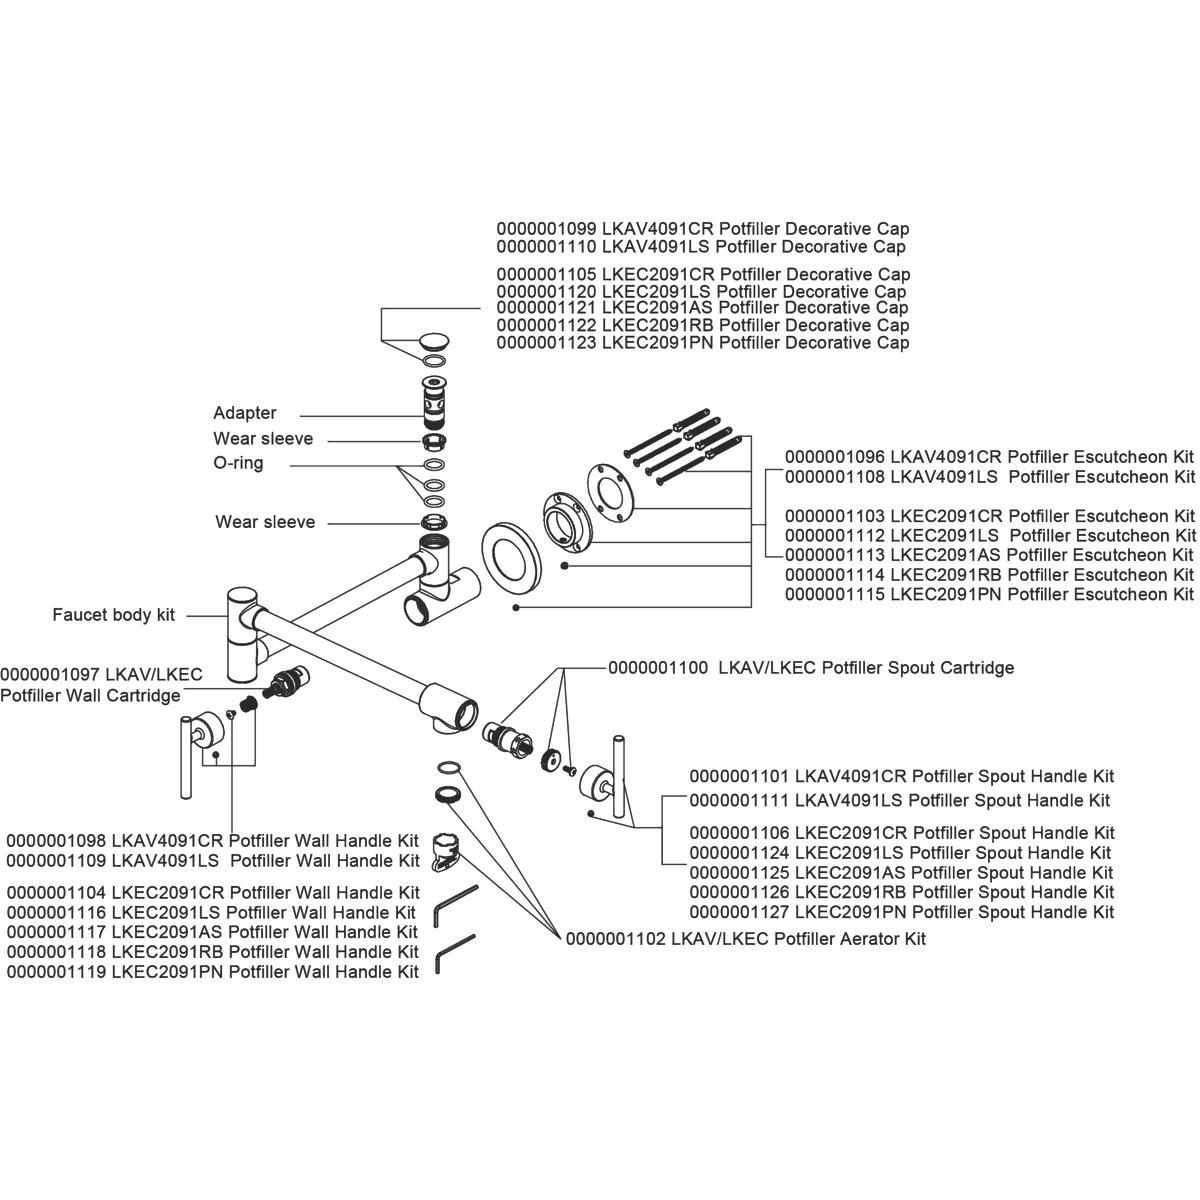 Blue SoDo Tek TM RJ45 Cat5e Ethernet Patch Cable for Samsung MyJet Plus MJC-2300C Printer 25 ft